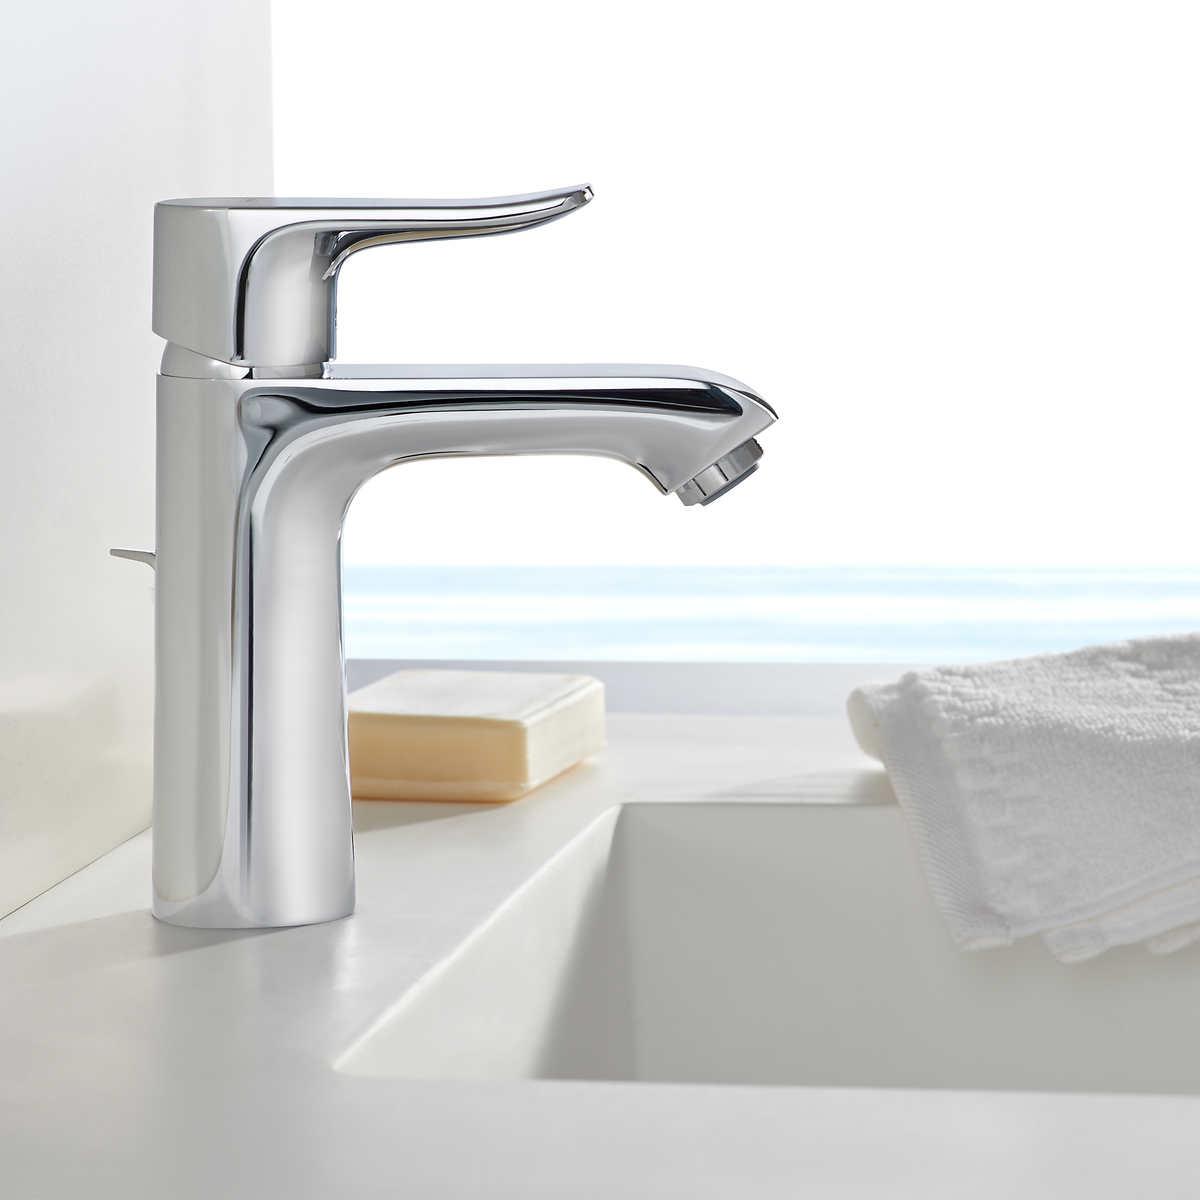 hansgrohe logis loop single hole bathroom faucet